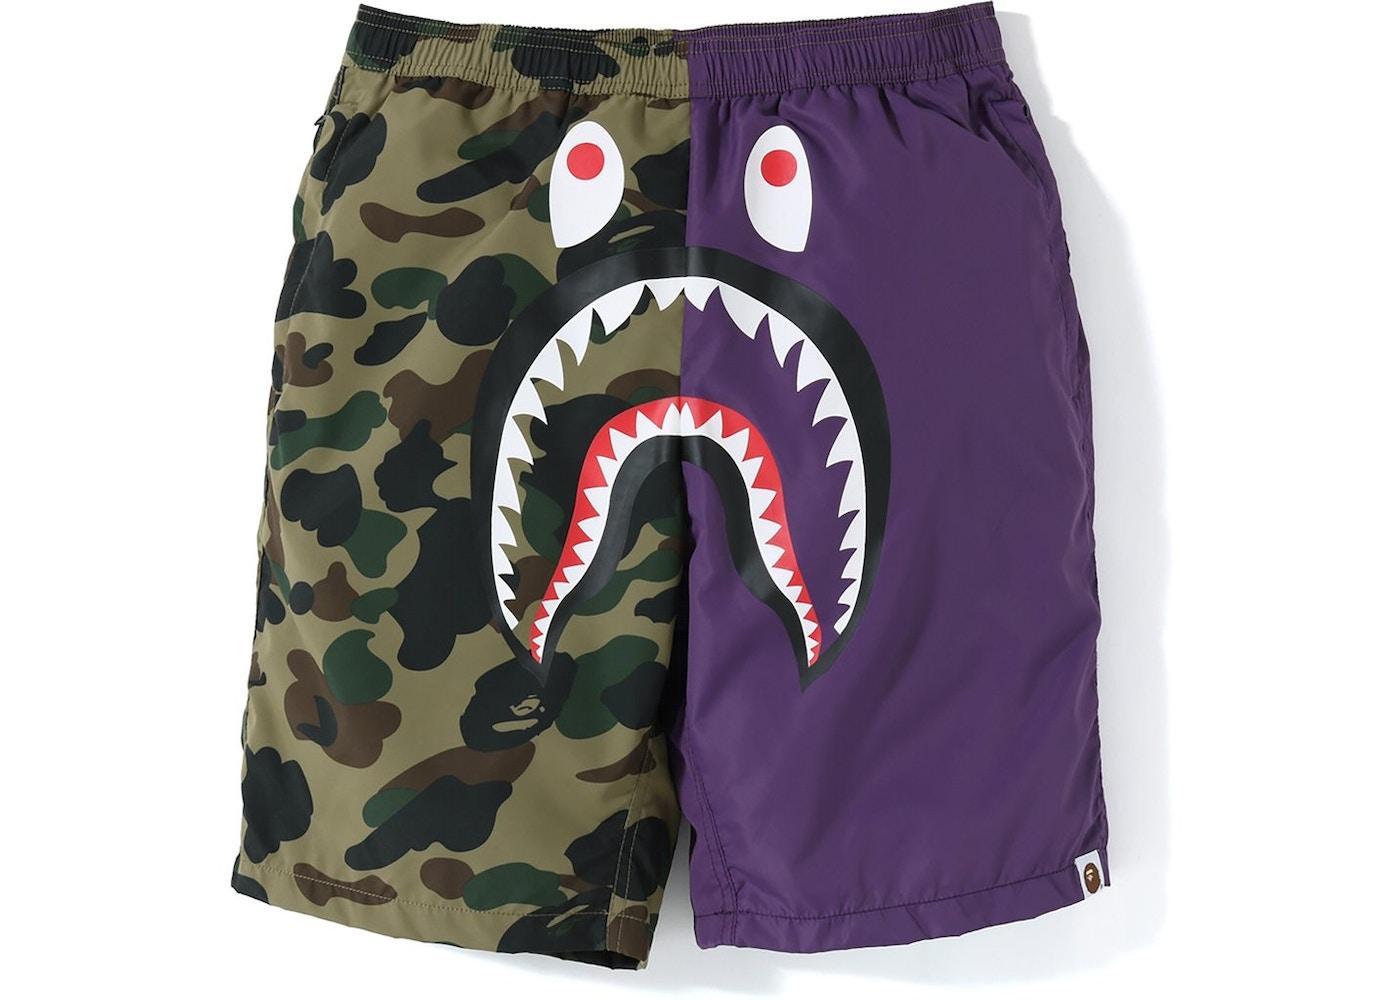 791ace00e936 BAPE Half 1st Camo Shark Beach Shorts Purple Green - SS19